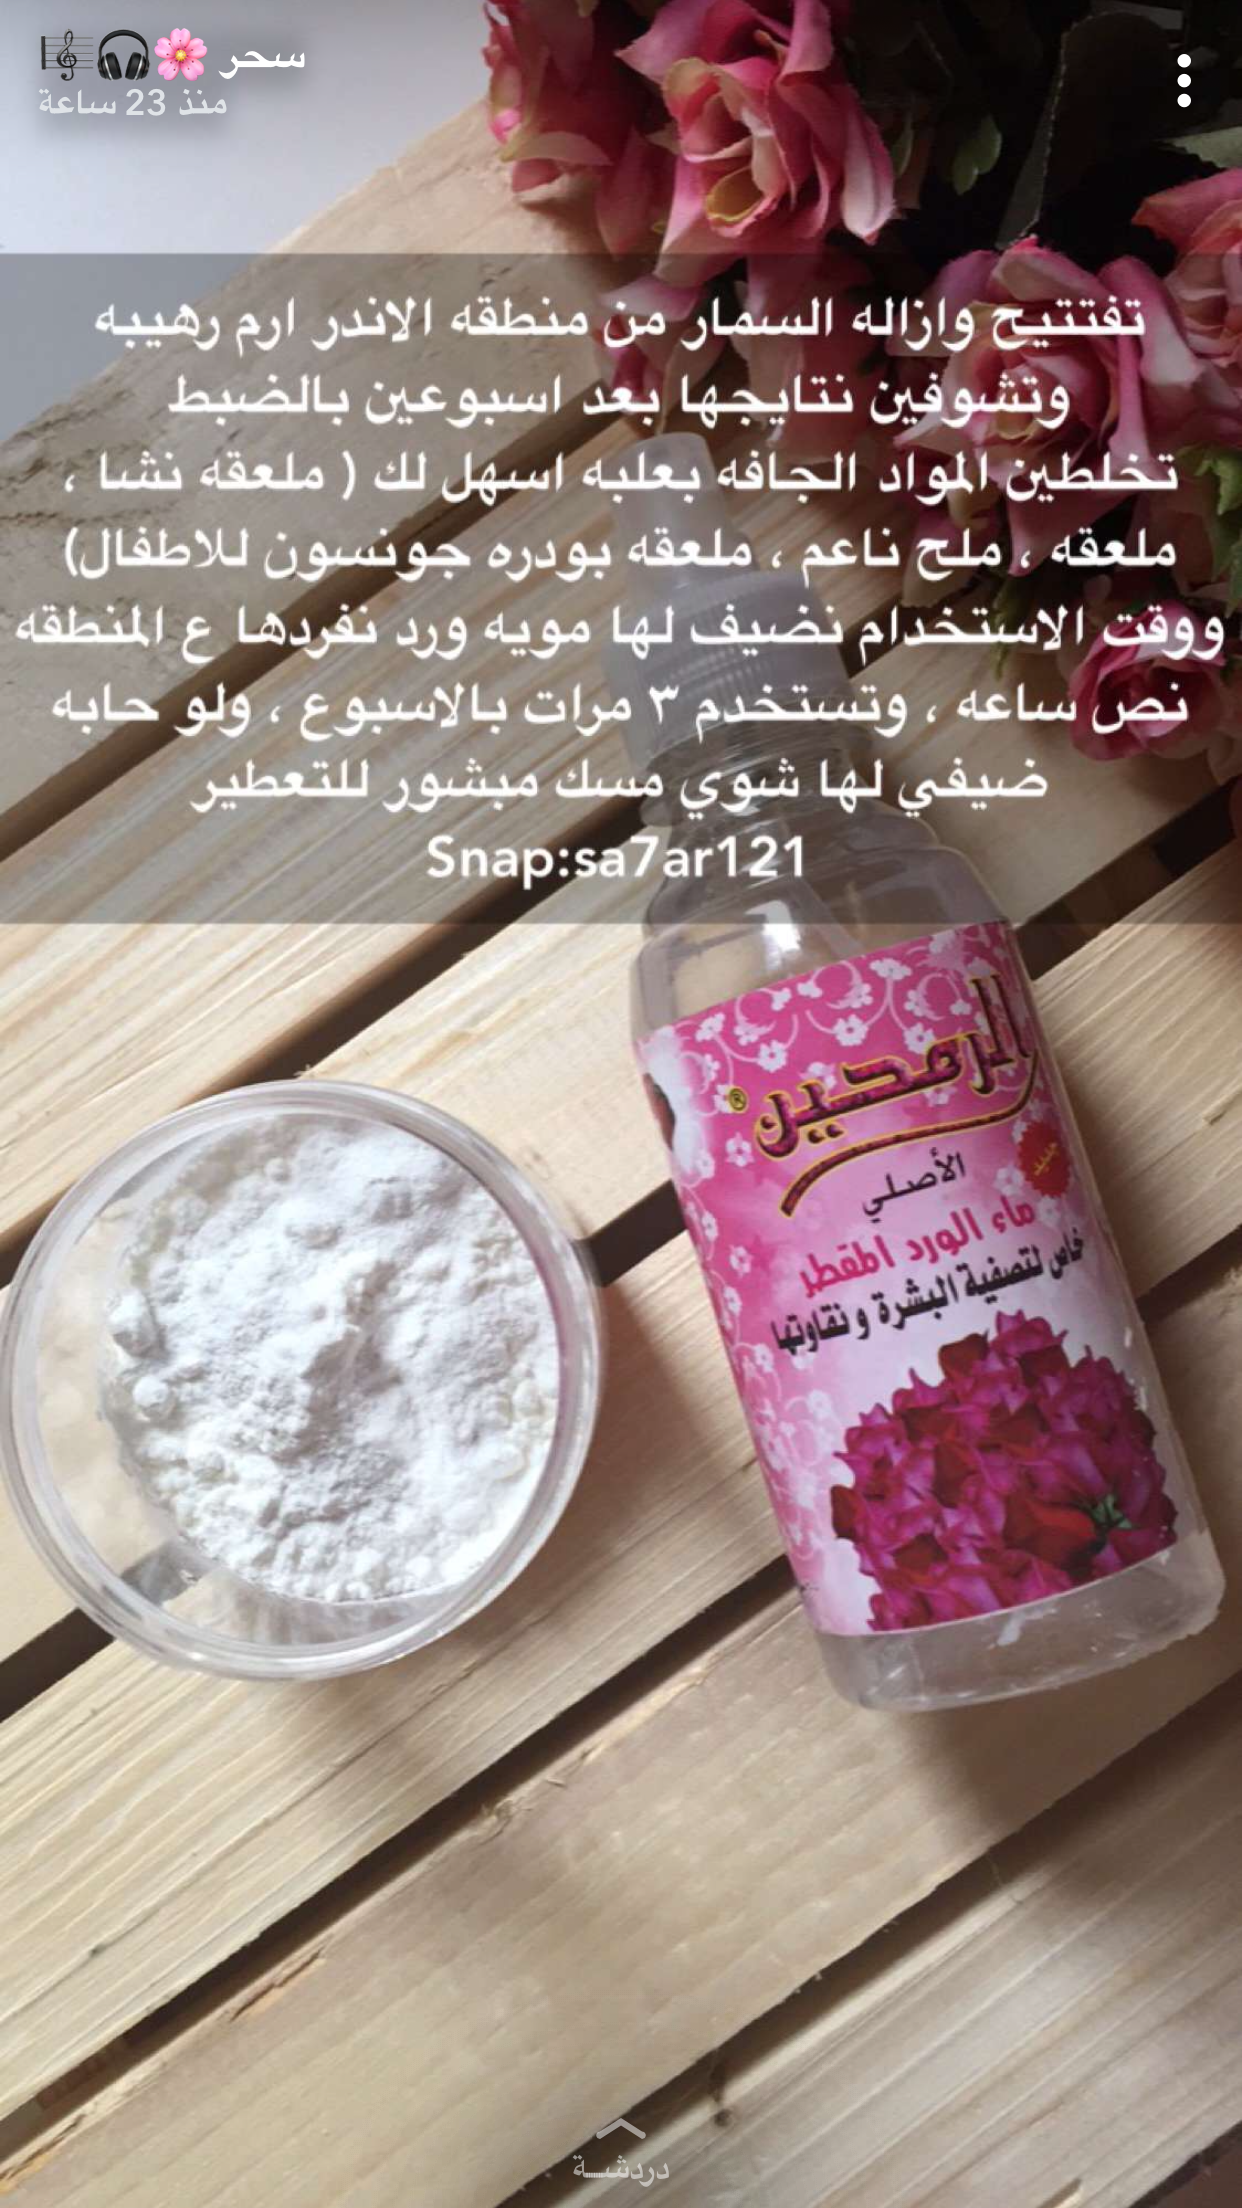 Pin By Majd On عناية ودلع Natural Skin Care Diy Diy Skin Care Routine Beauty Skin Care Routine